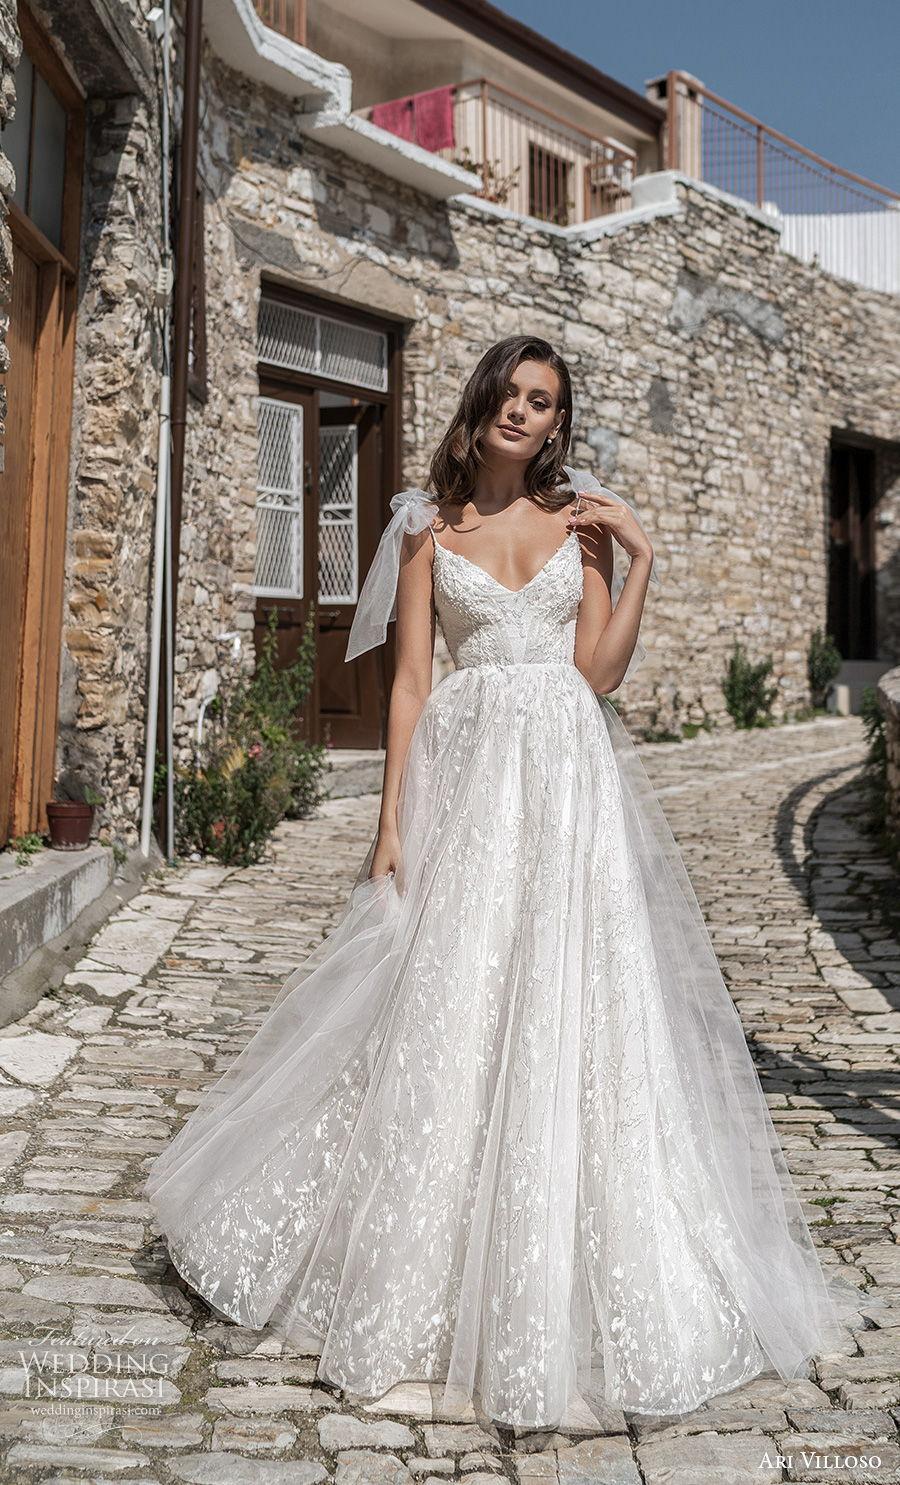 ari villoso 2021 bridal ribbon spaghetti strap diamond neckline full embellished bodice romantic a  line wedding dress v back medium train (12) mv